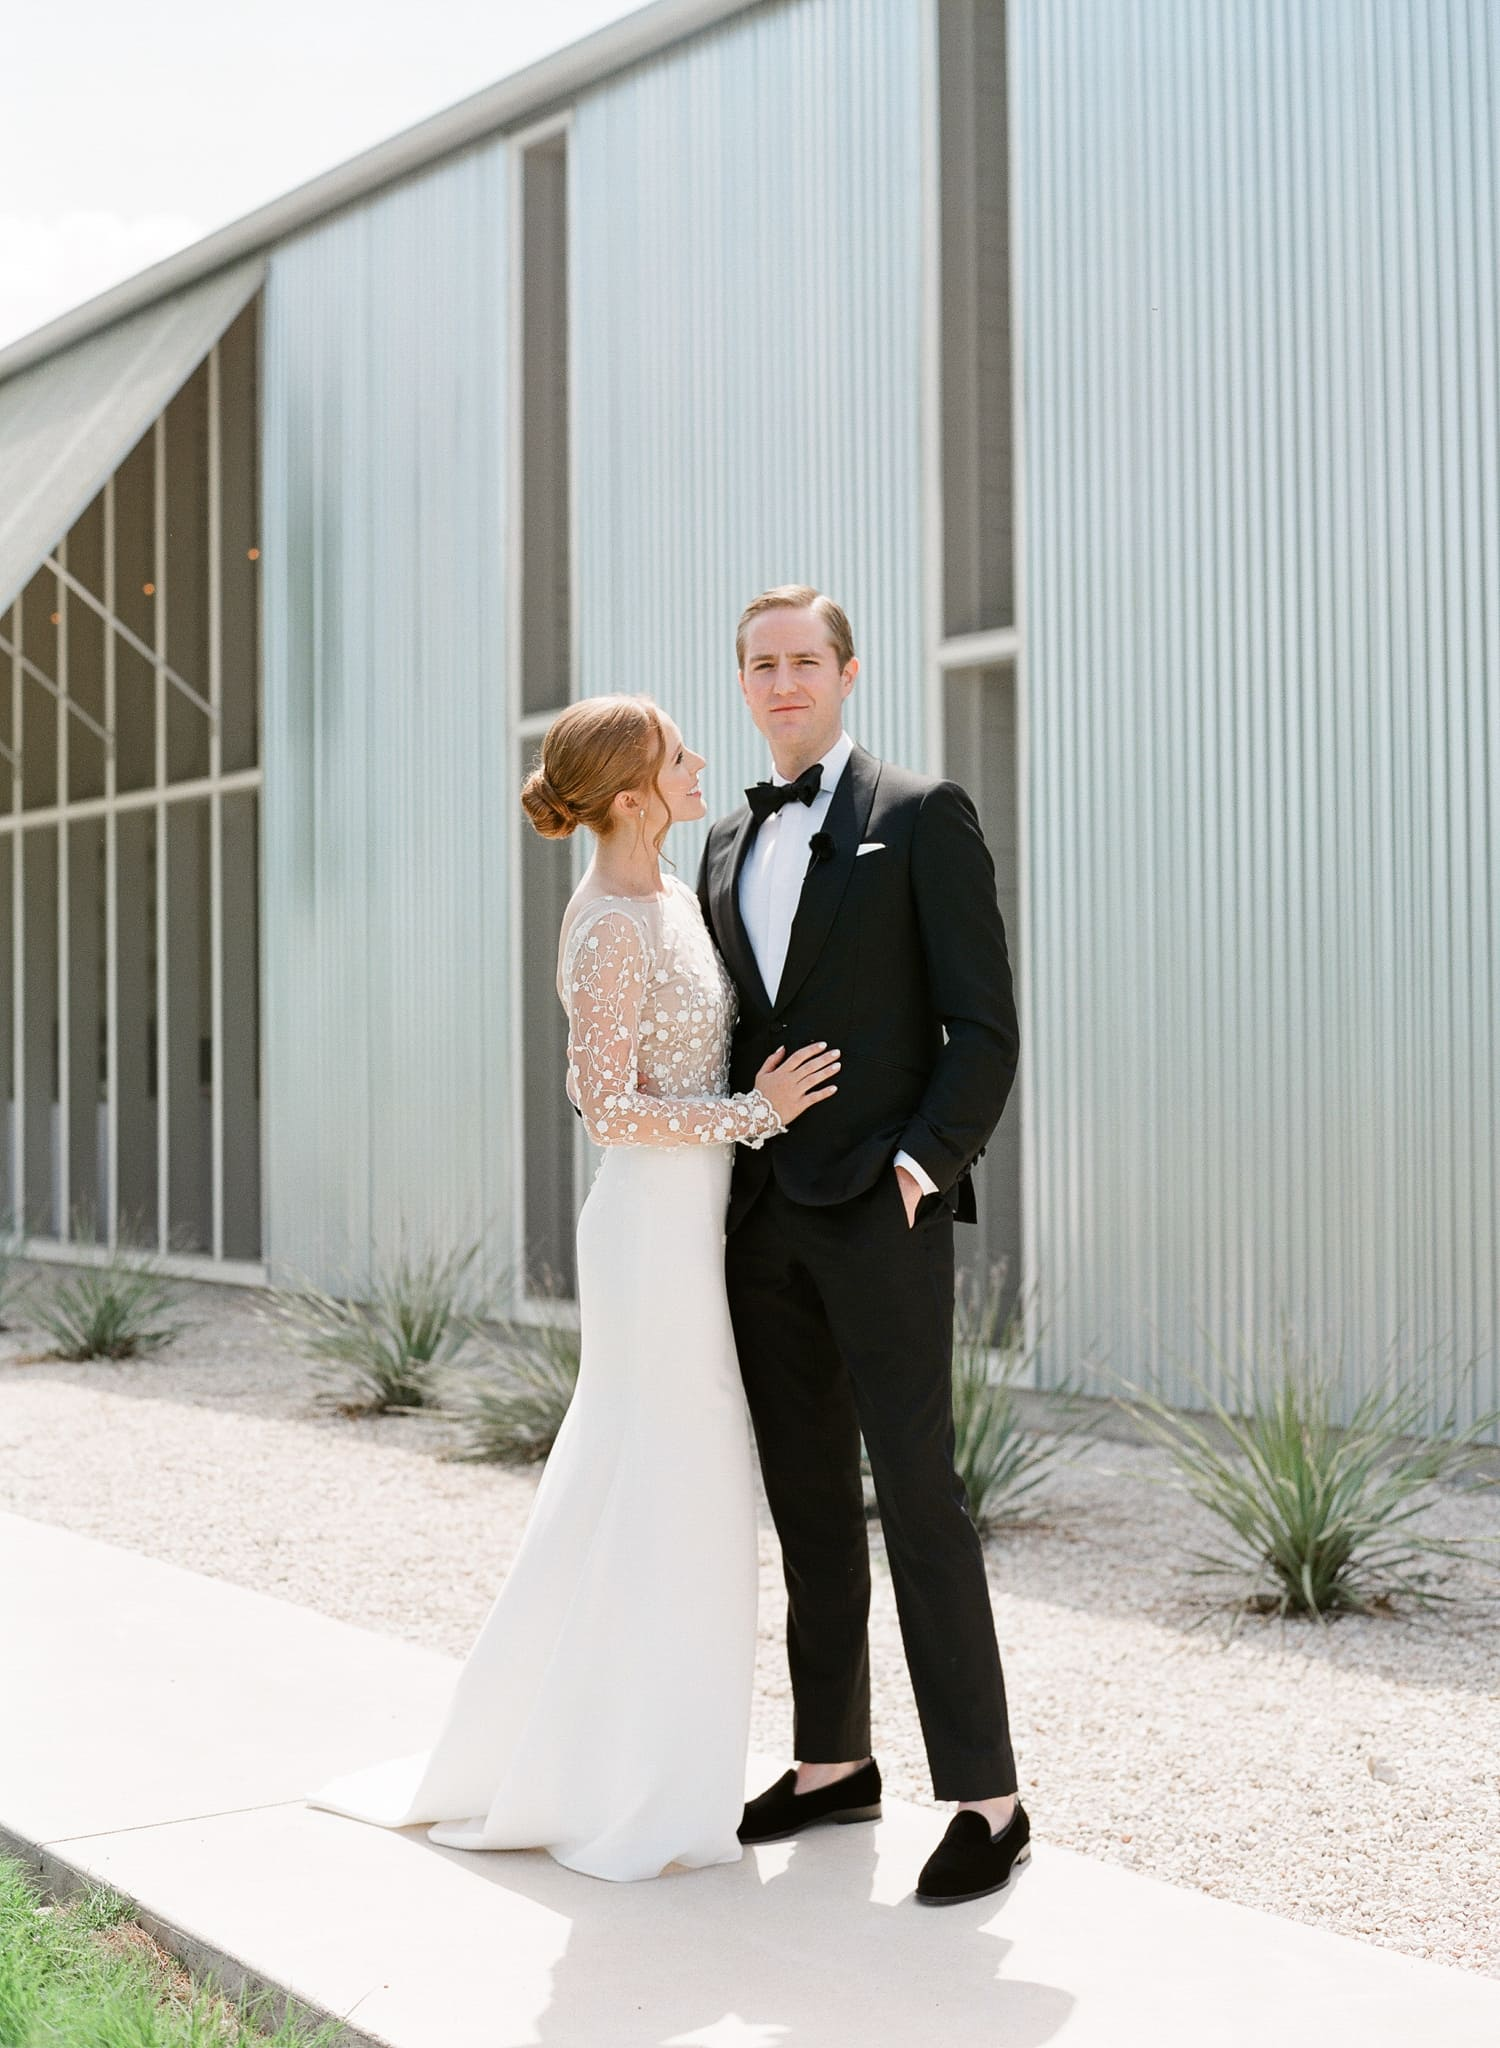 prospect-house-wedding-35.jpg